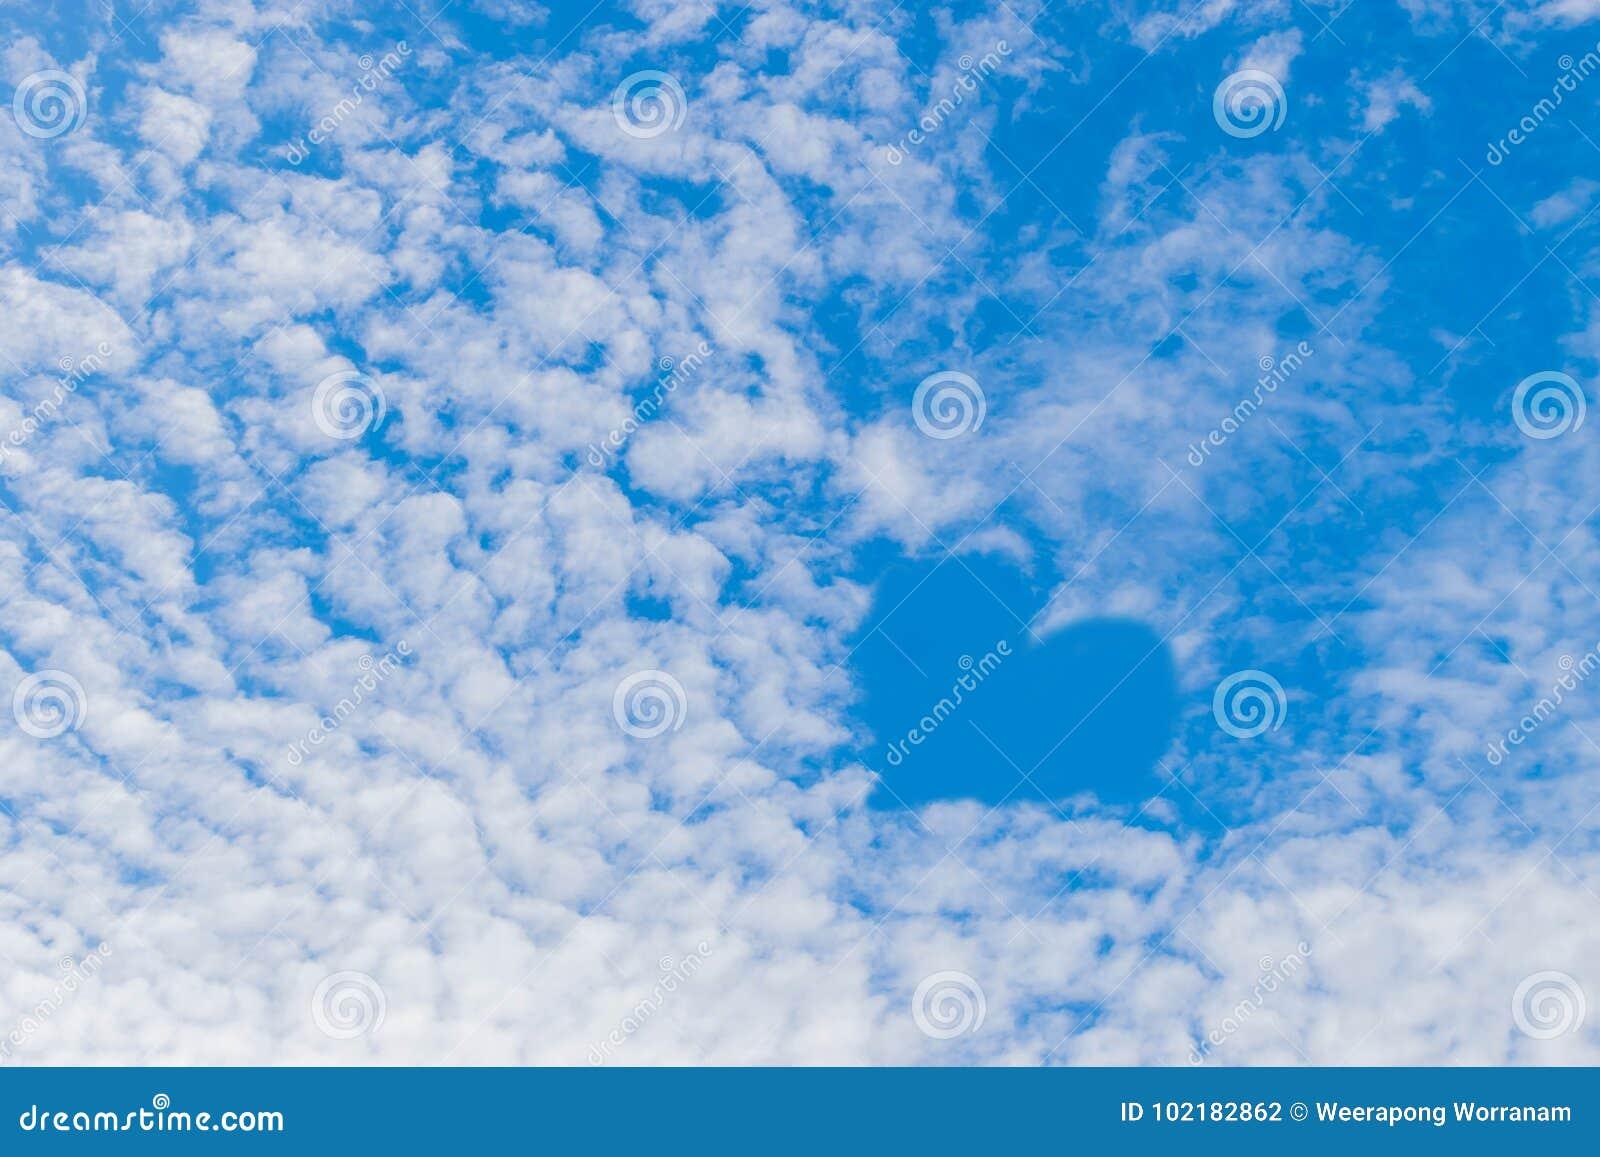 The soft focus surface texture of blue sky, sky love, wonderful sky cloud background.